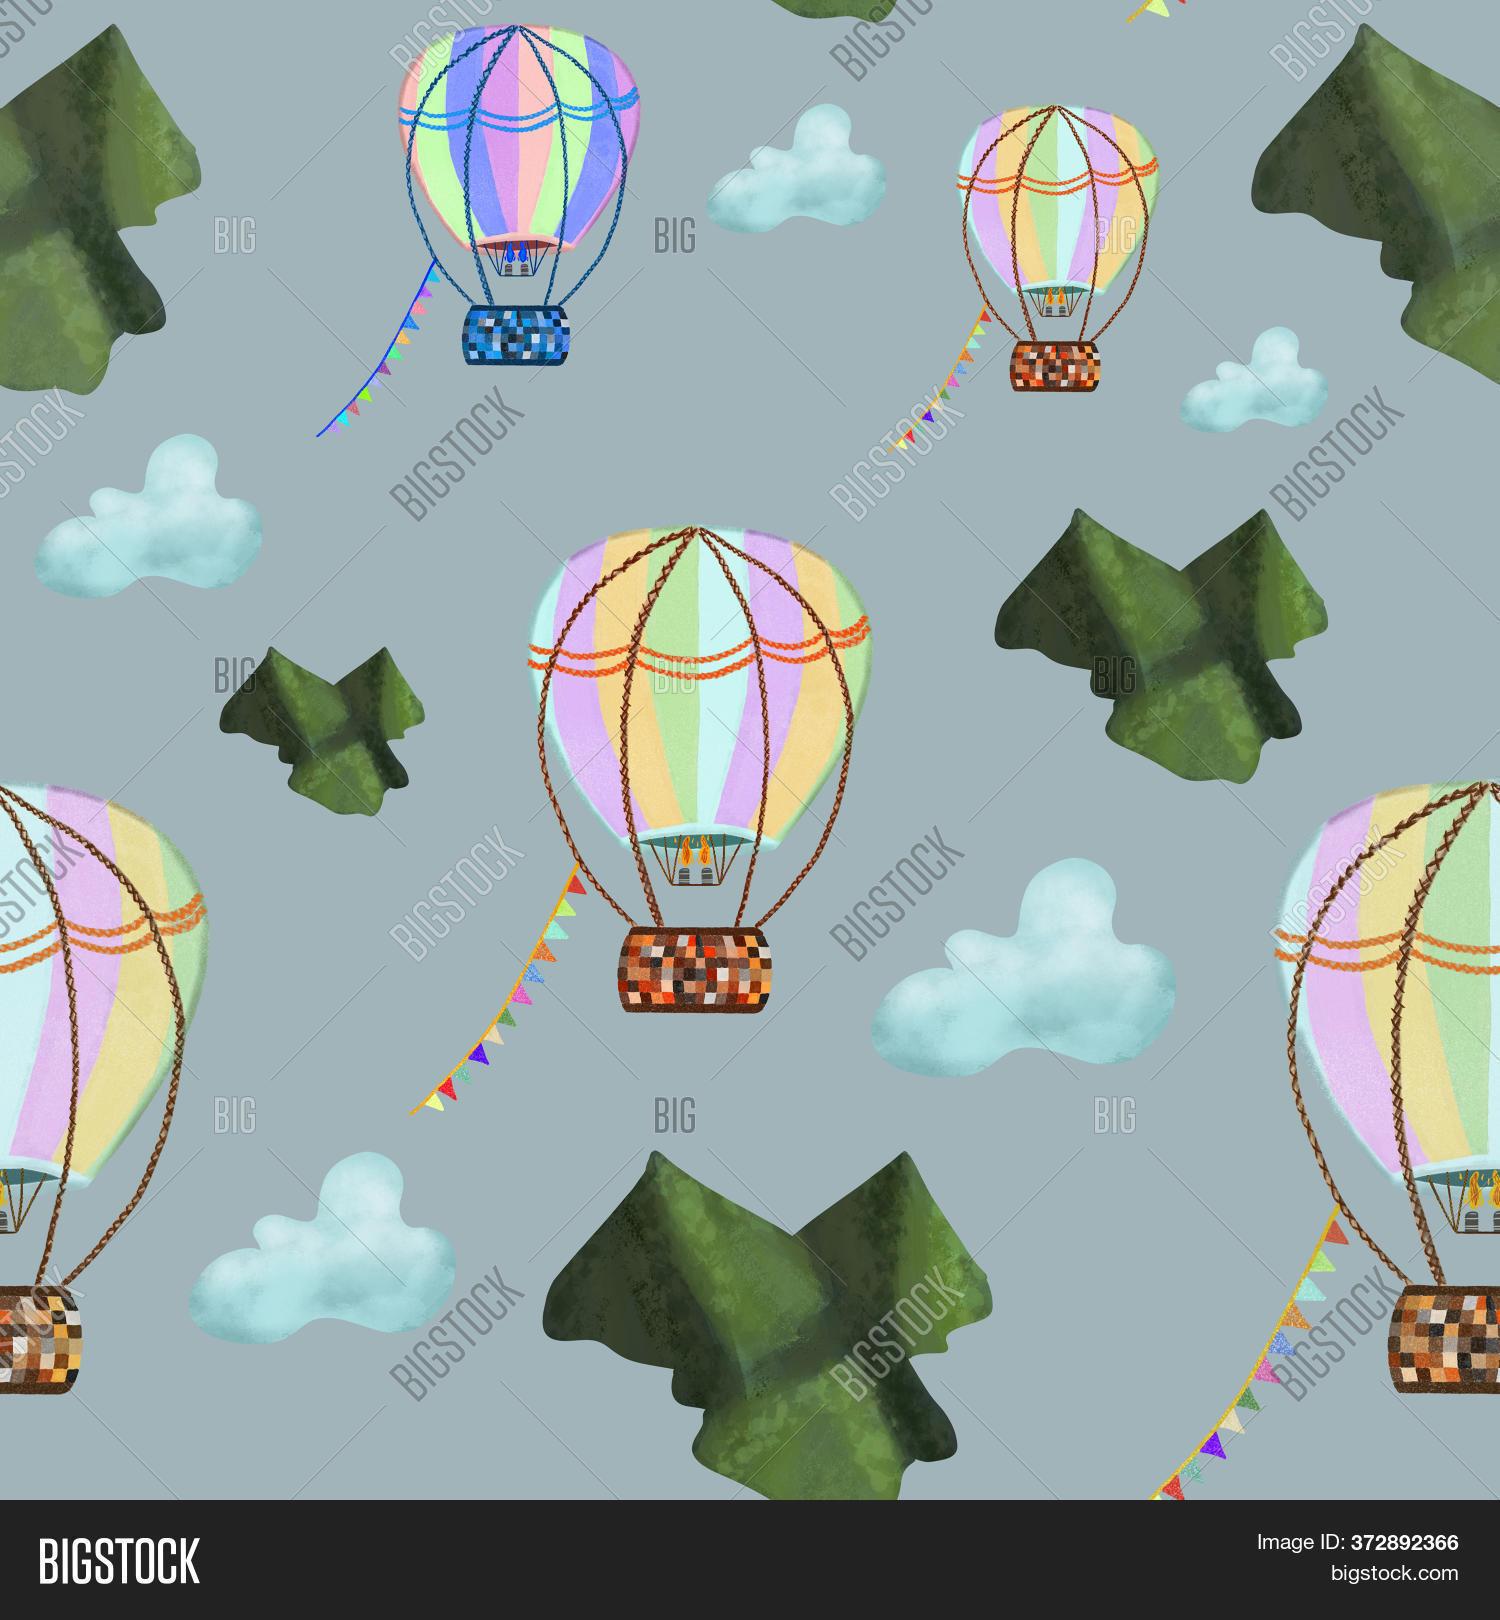 Hot Air Balloons Image Photo Free Trial Bigstock